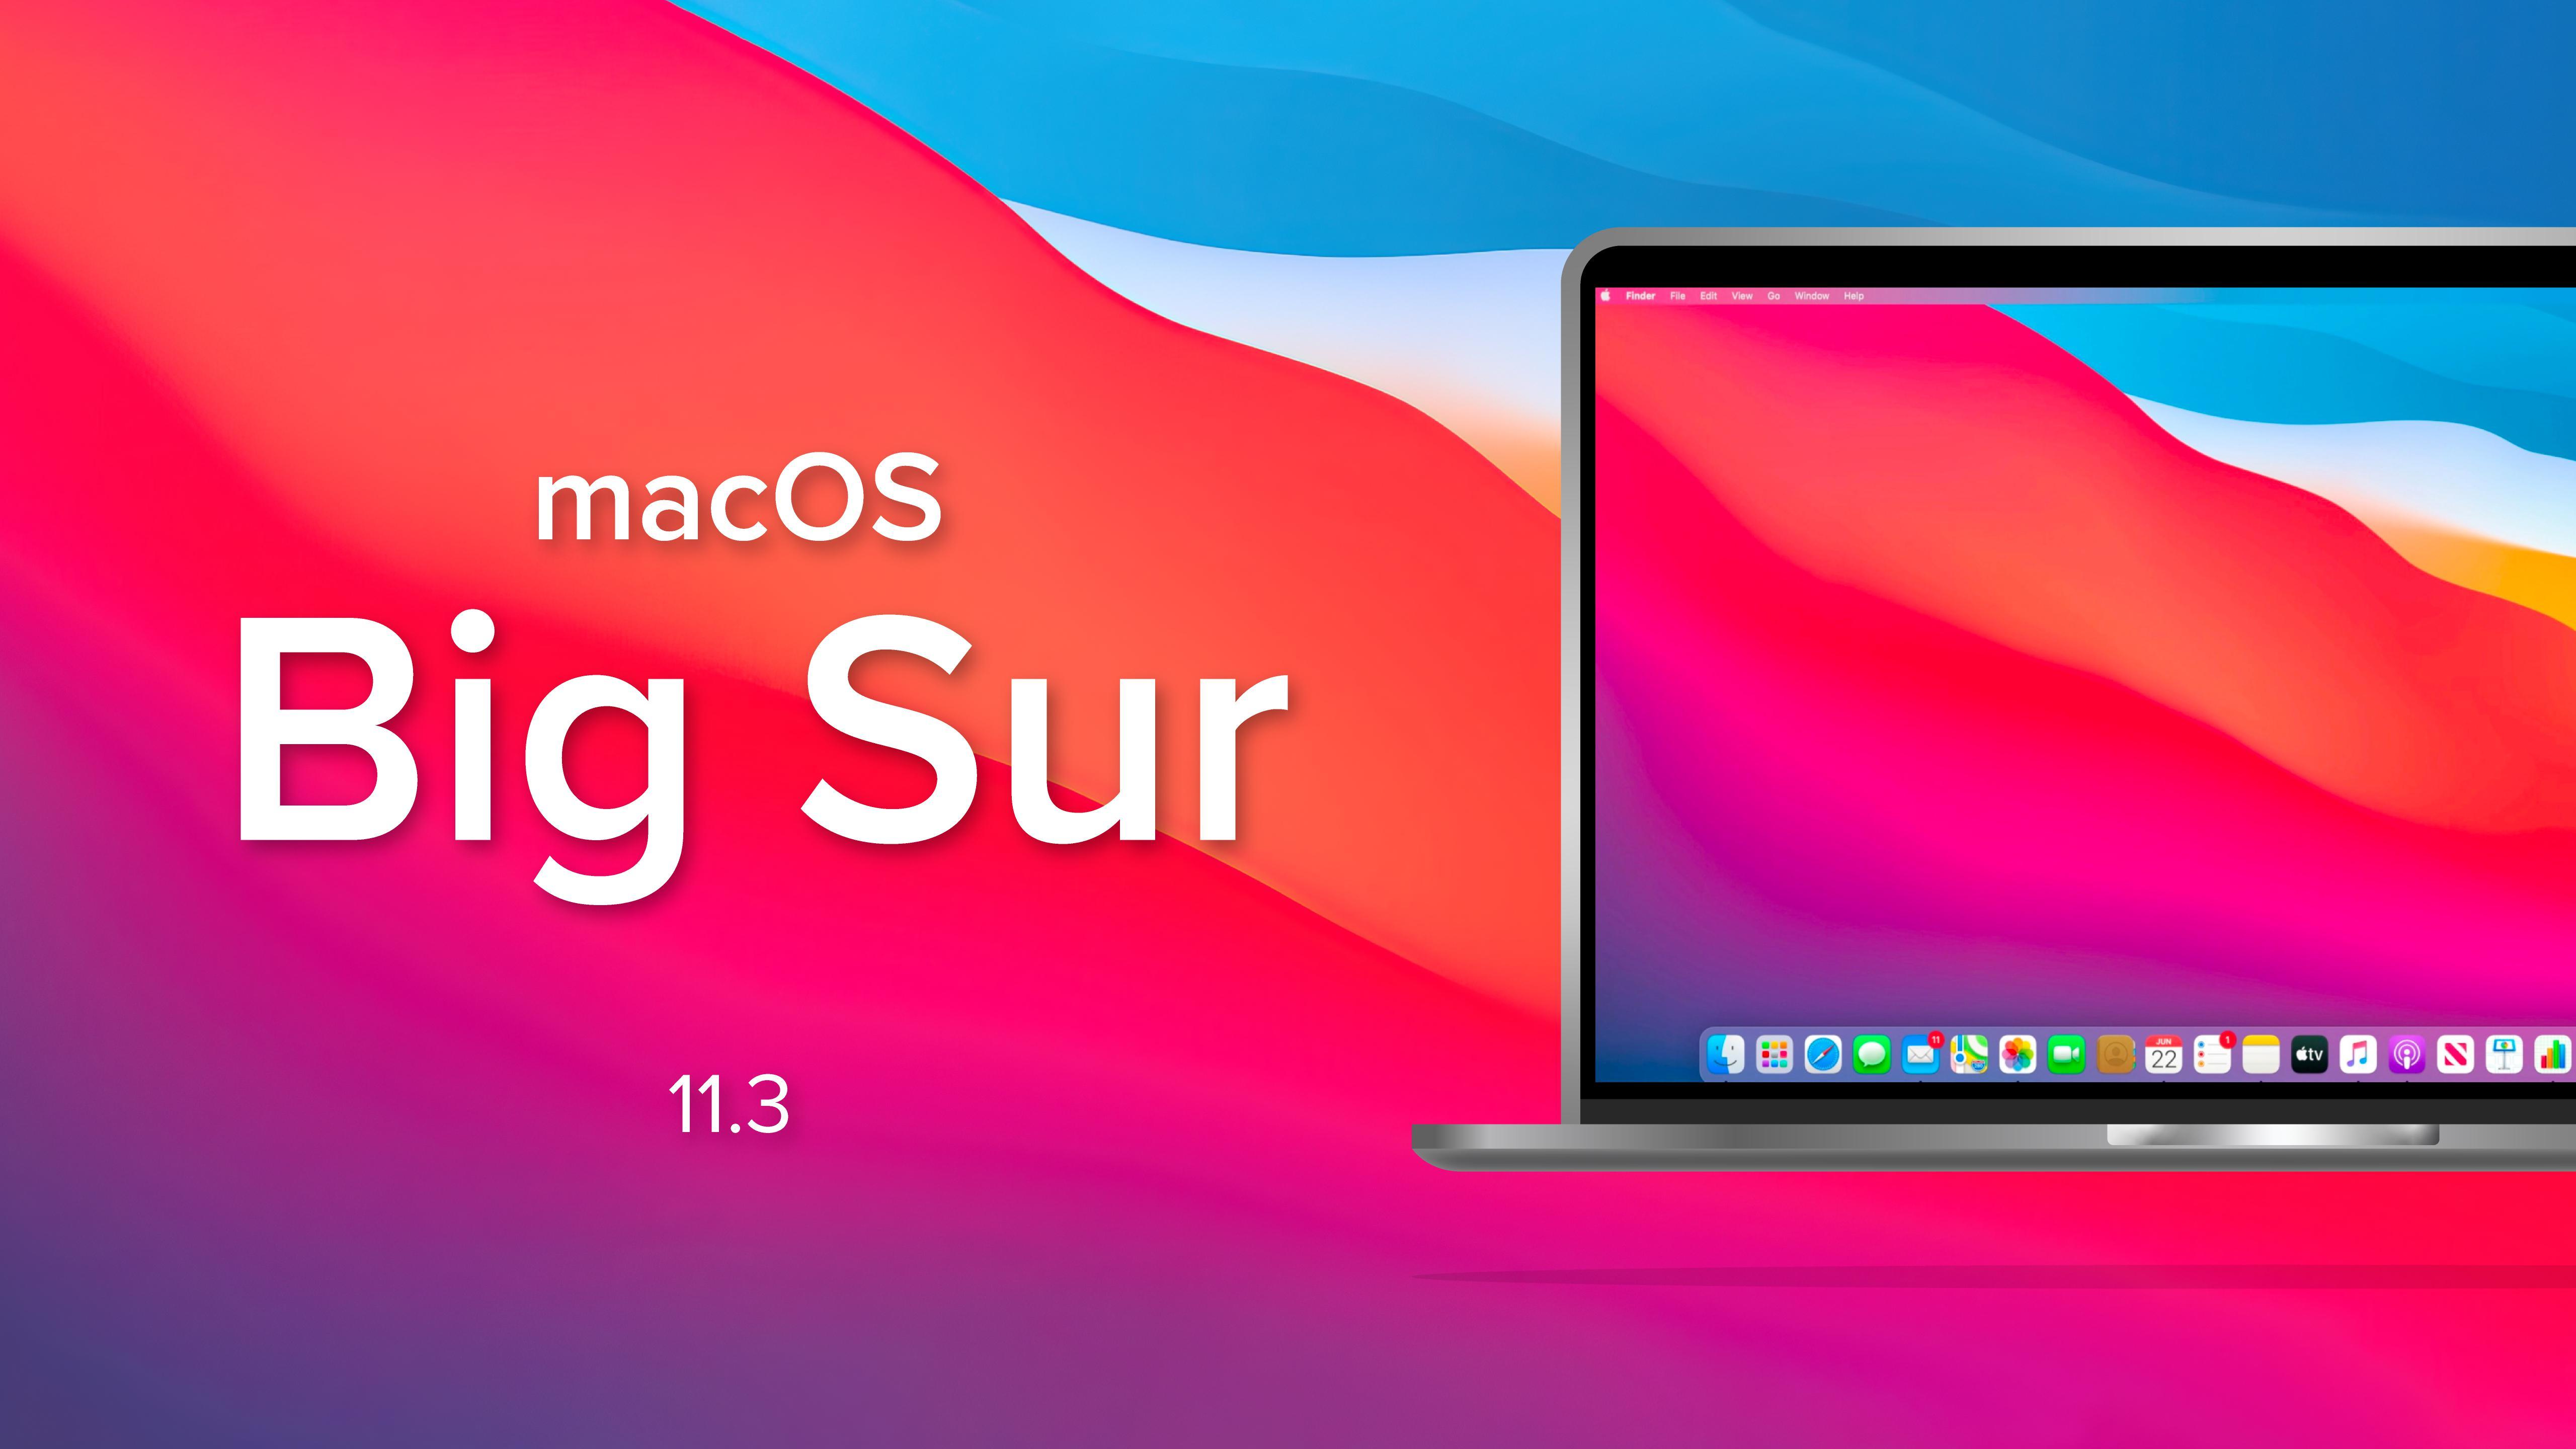 Laptop with macOS Big Sur